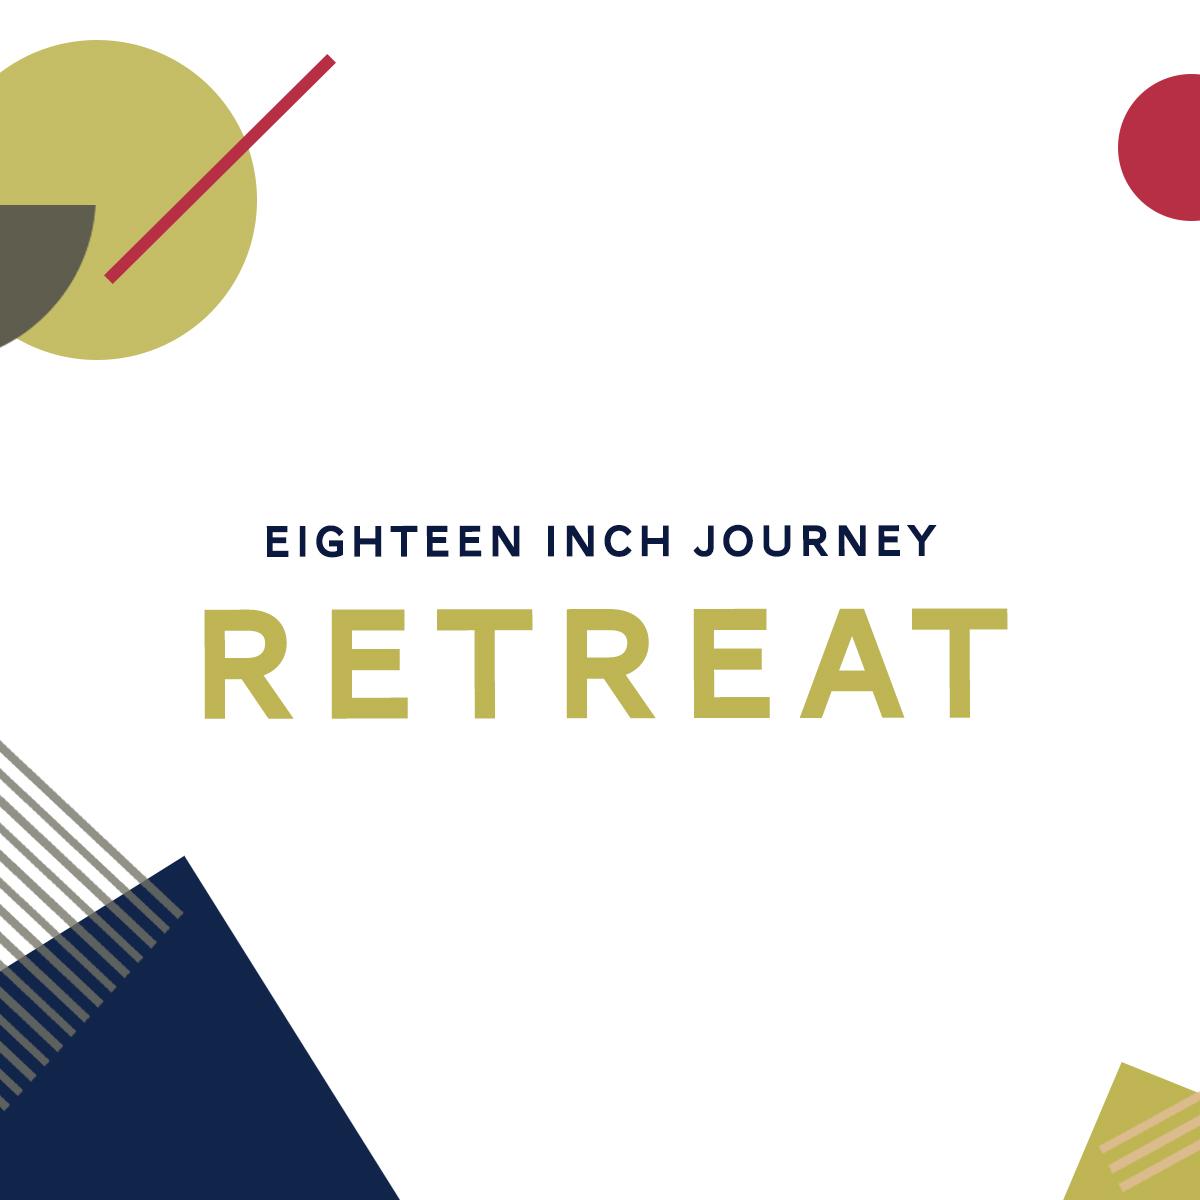 retreat_event.jpg